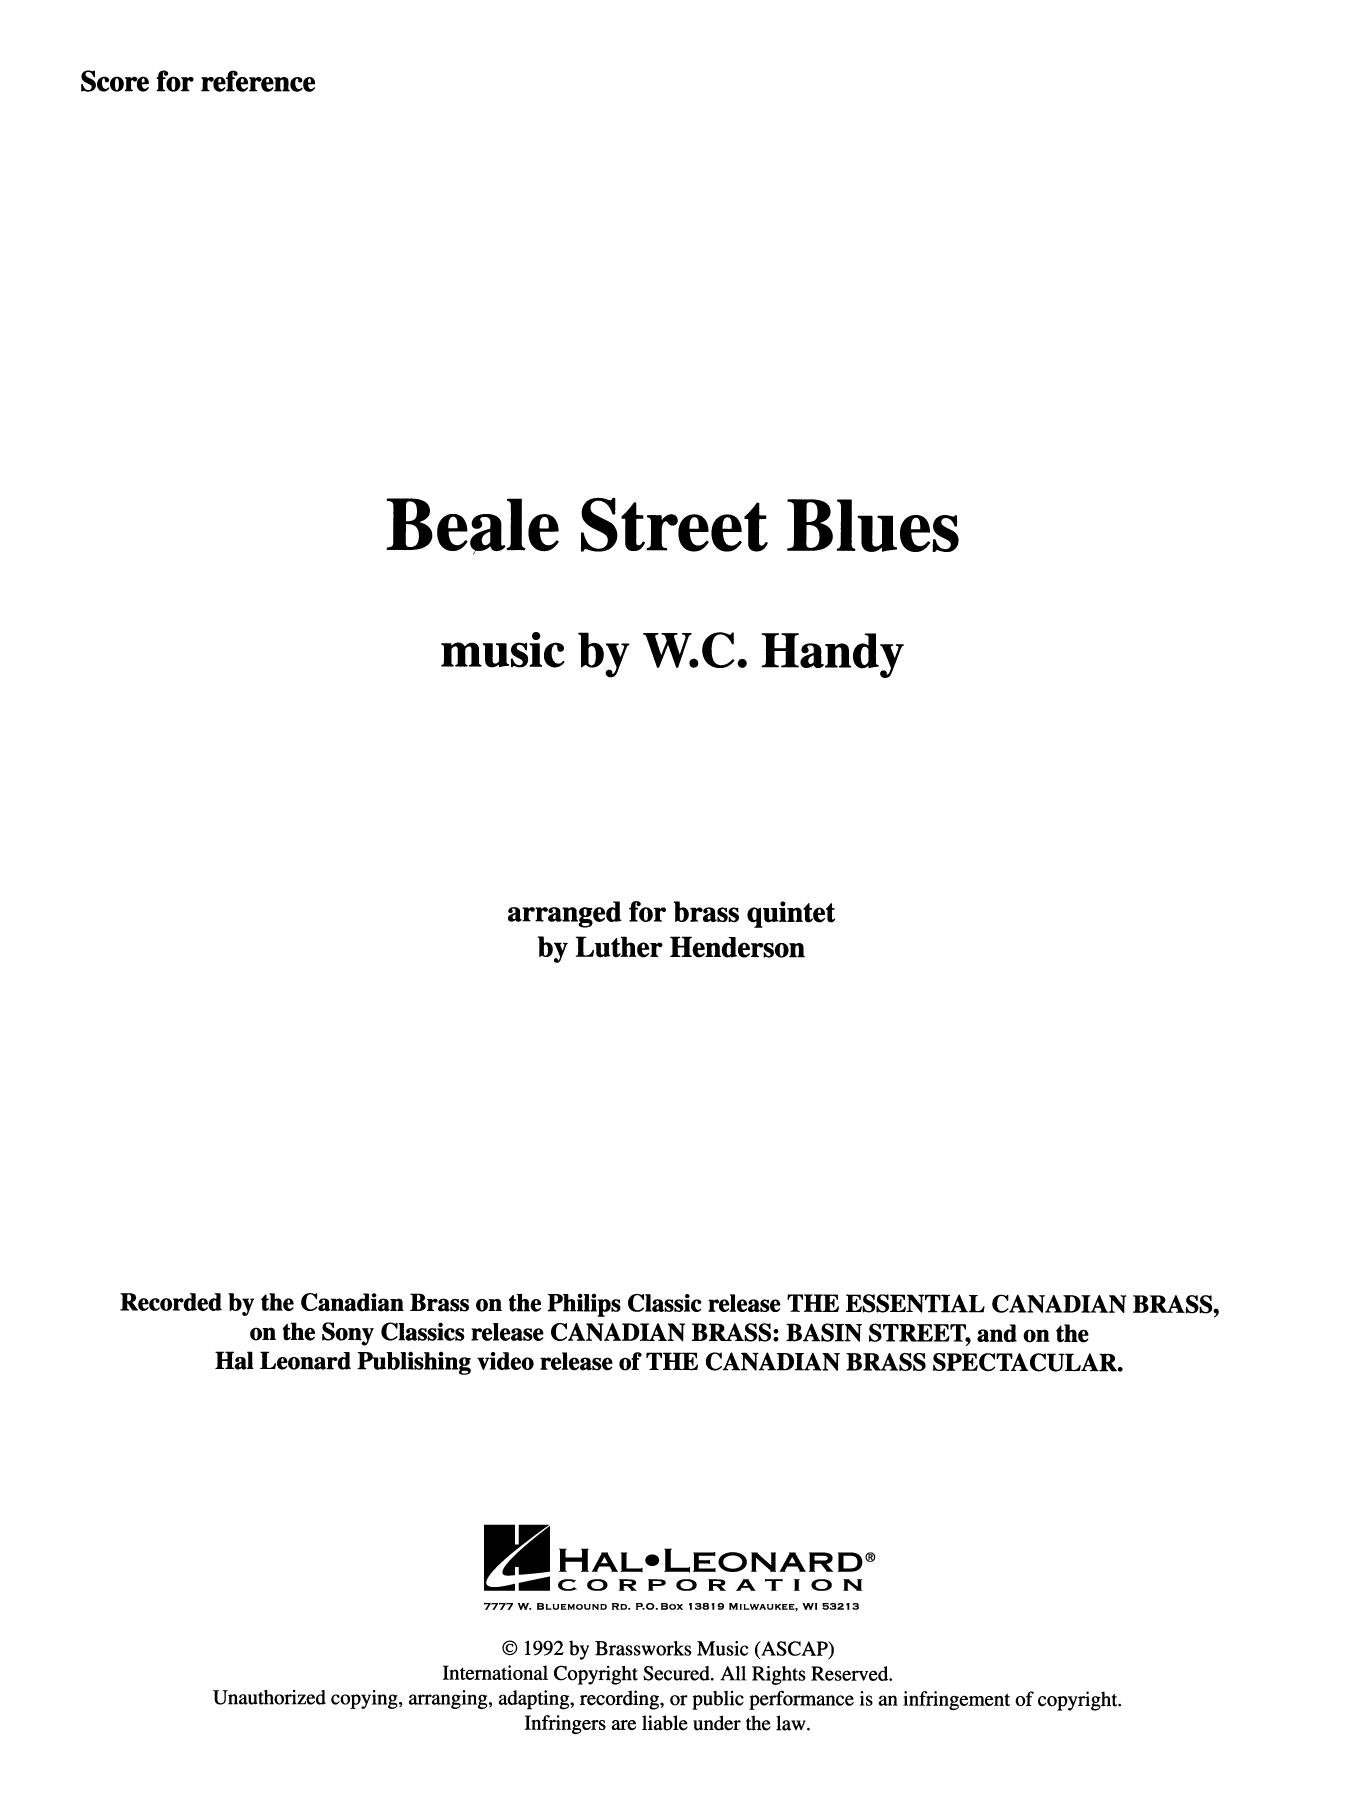 Beale Street Blues - Full Score Sheet Music